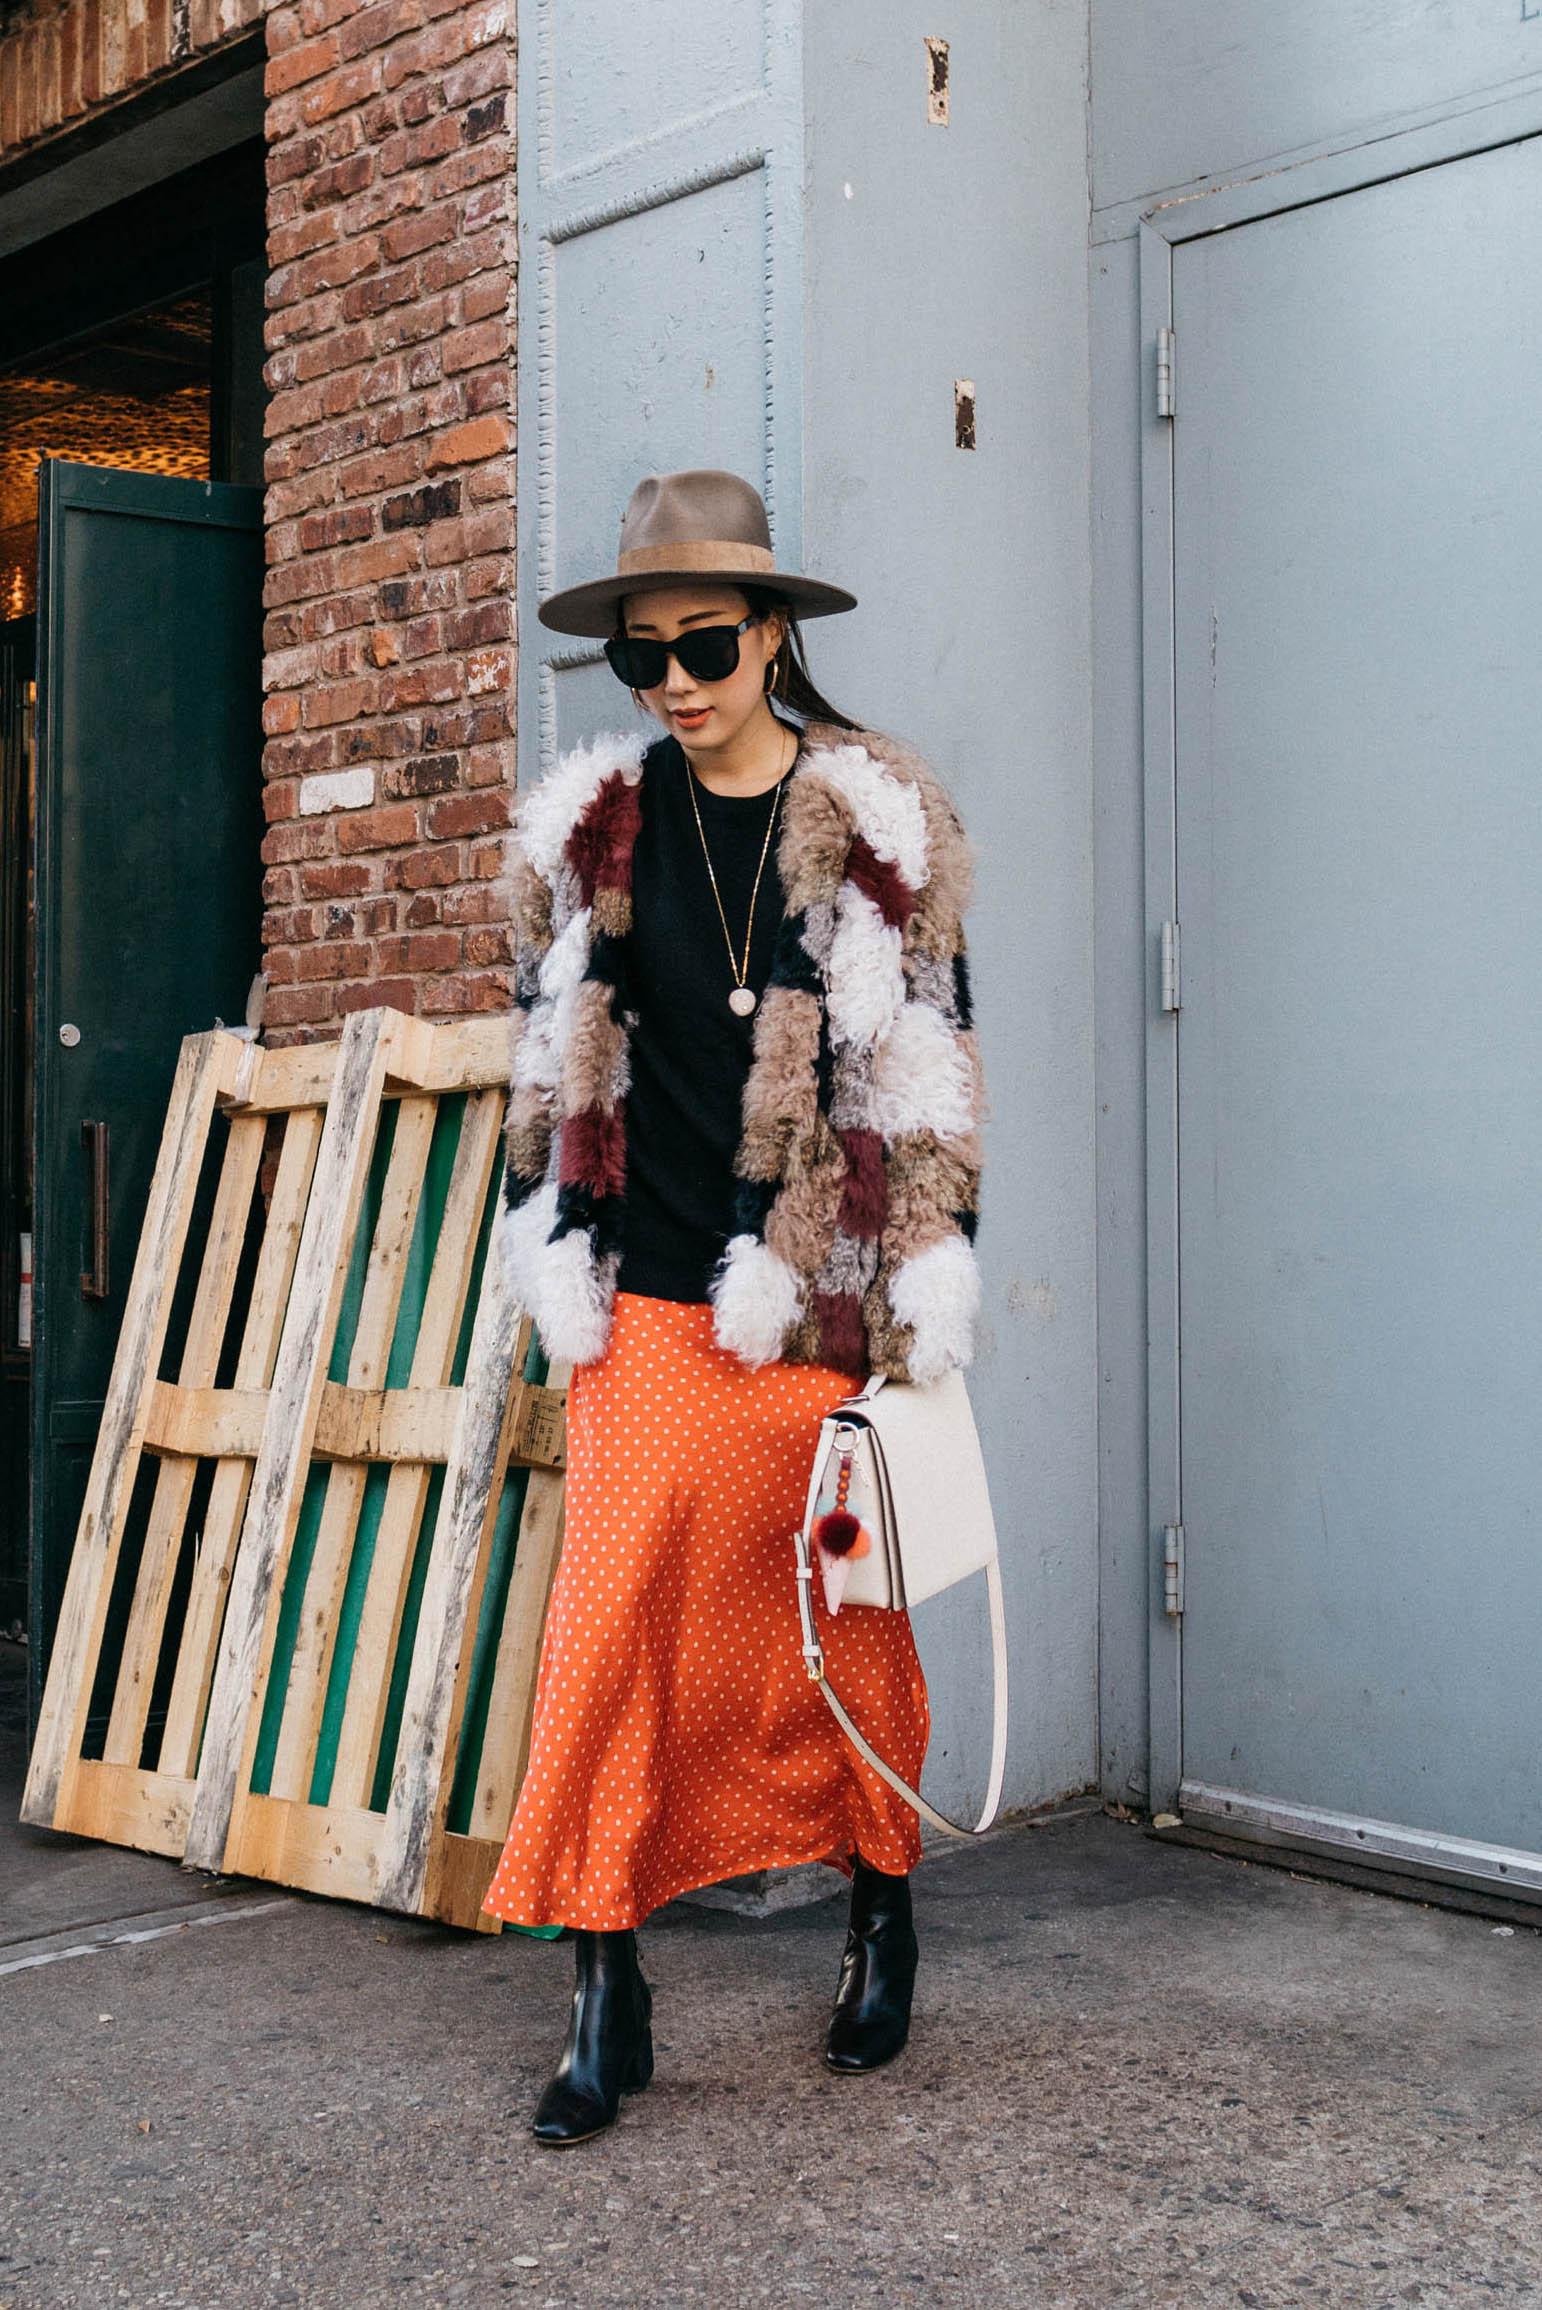 Ulla Johnson Coat,  Everlane Top ,  Sincerely Jules Dress ,  Milma Studio Bag ,  Fendi Charm , The Row Boots, Janessa Leone Hat